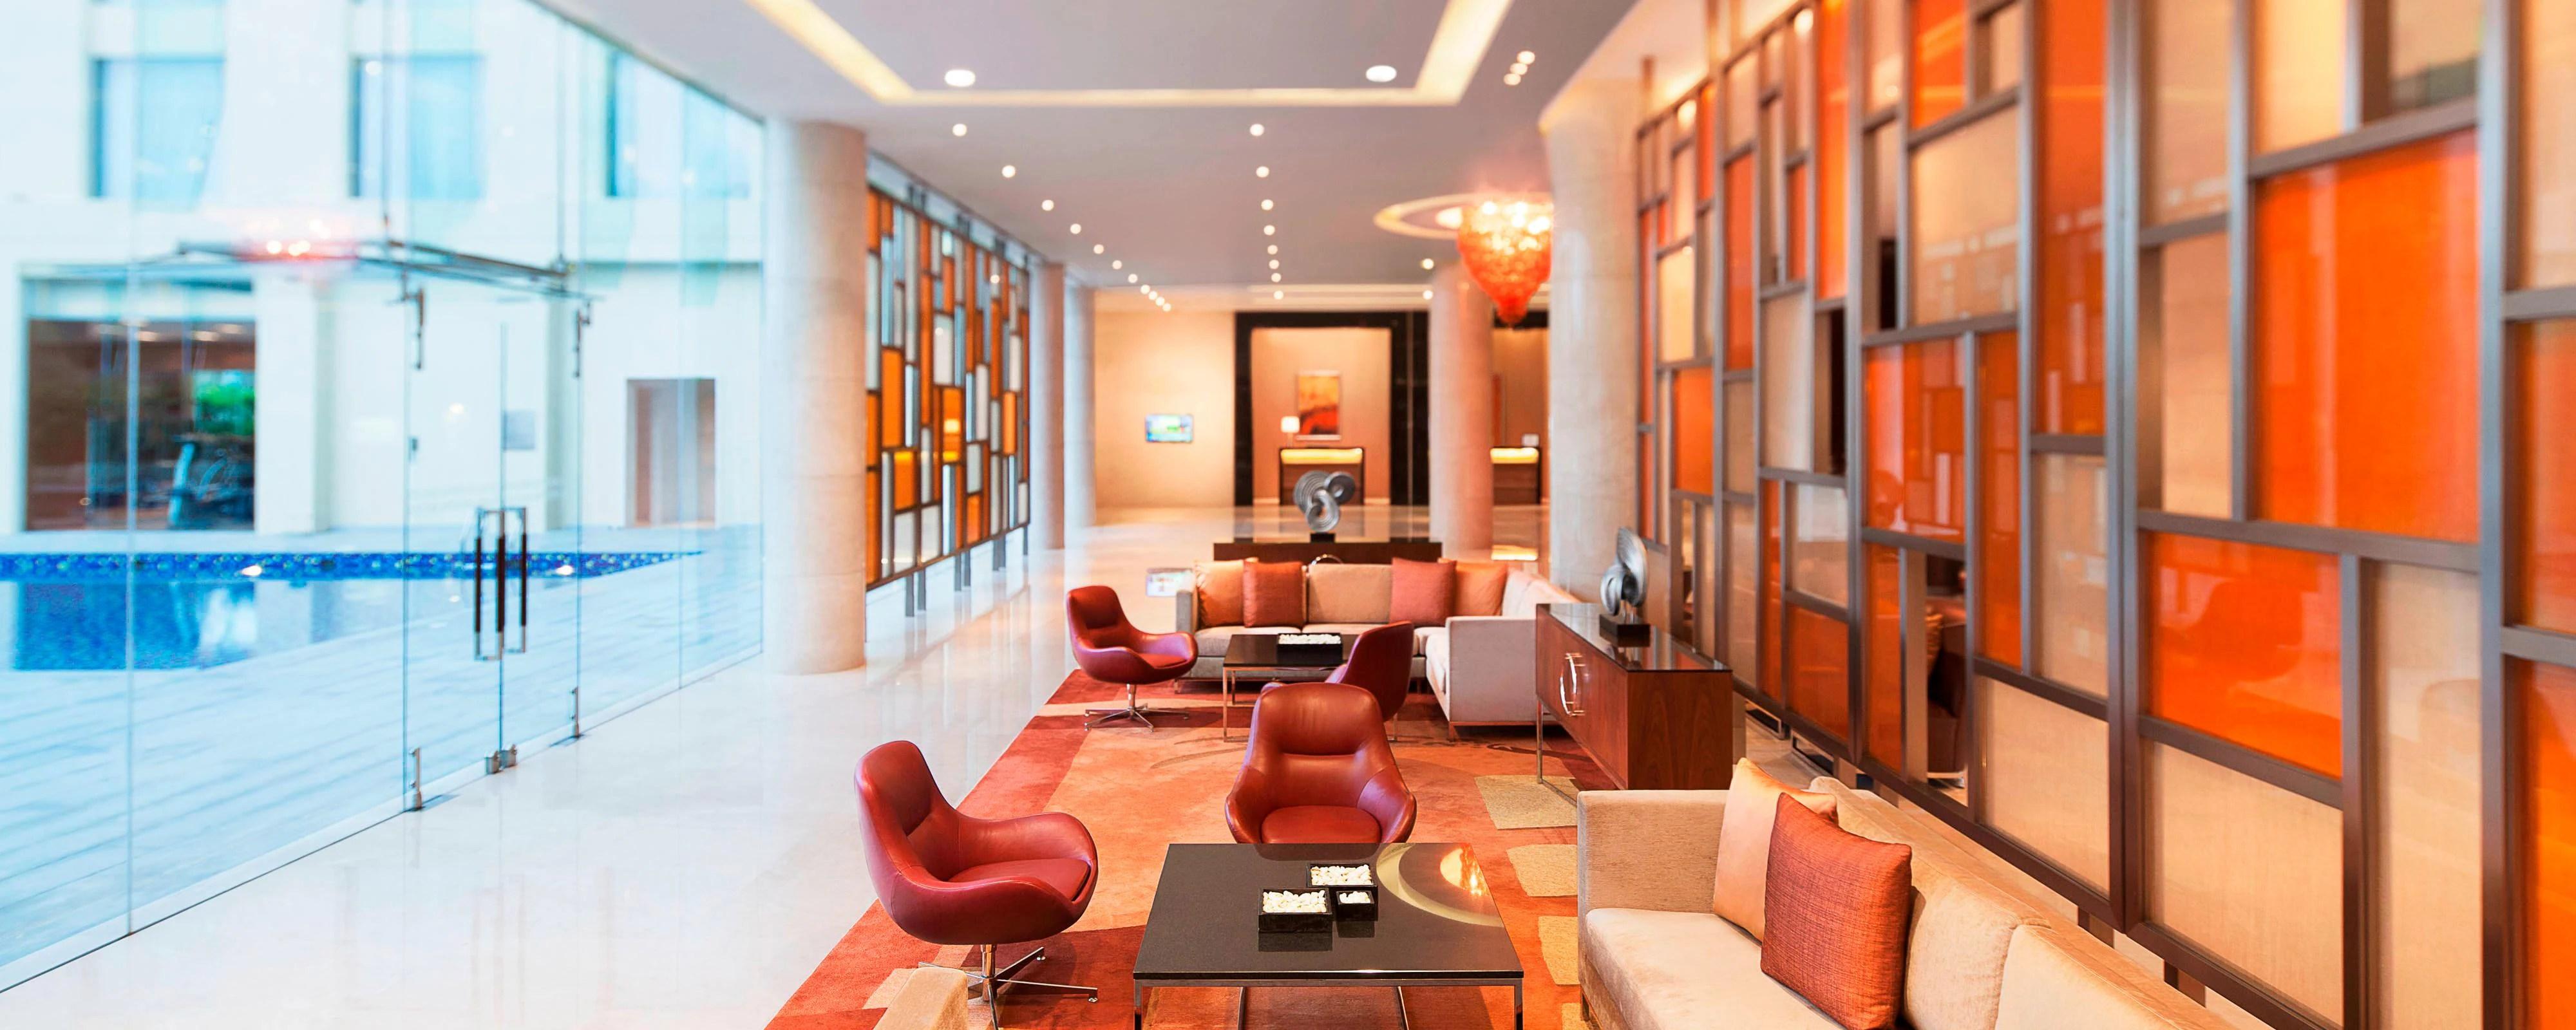 5Star Hotel Near Cochin Airport  Courtyard Kochi Airport